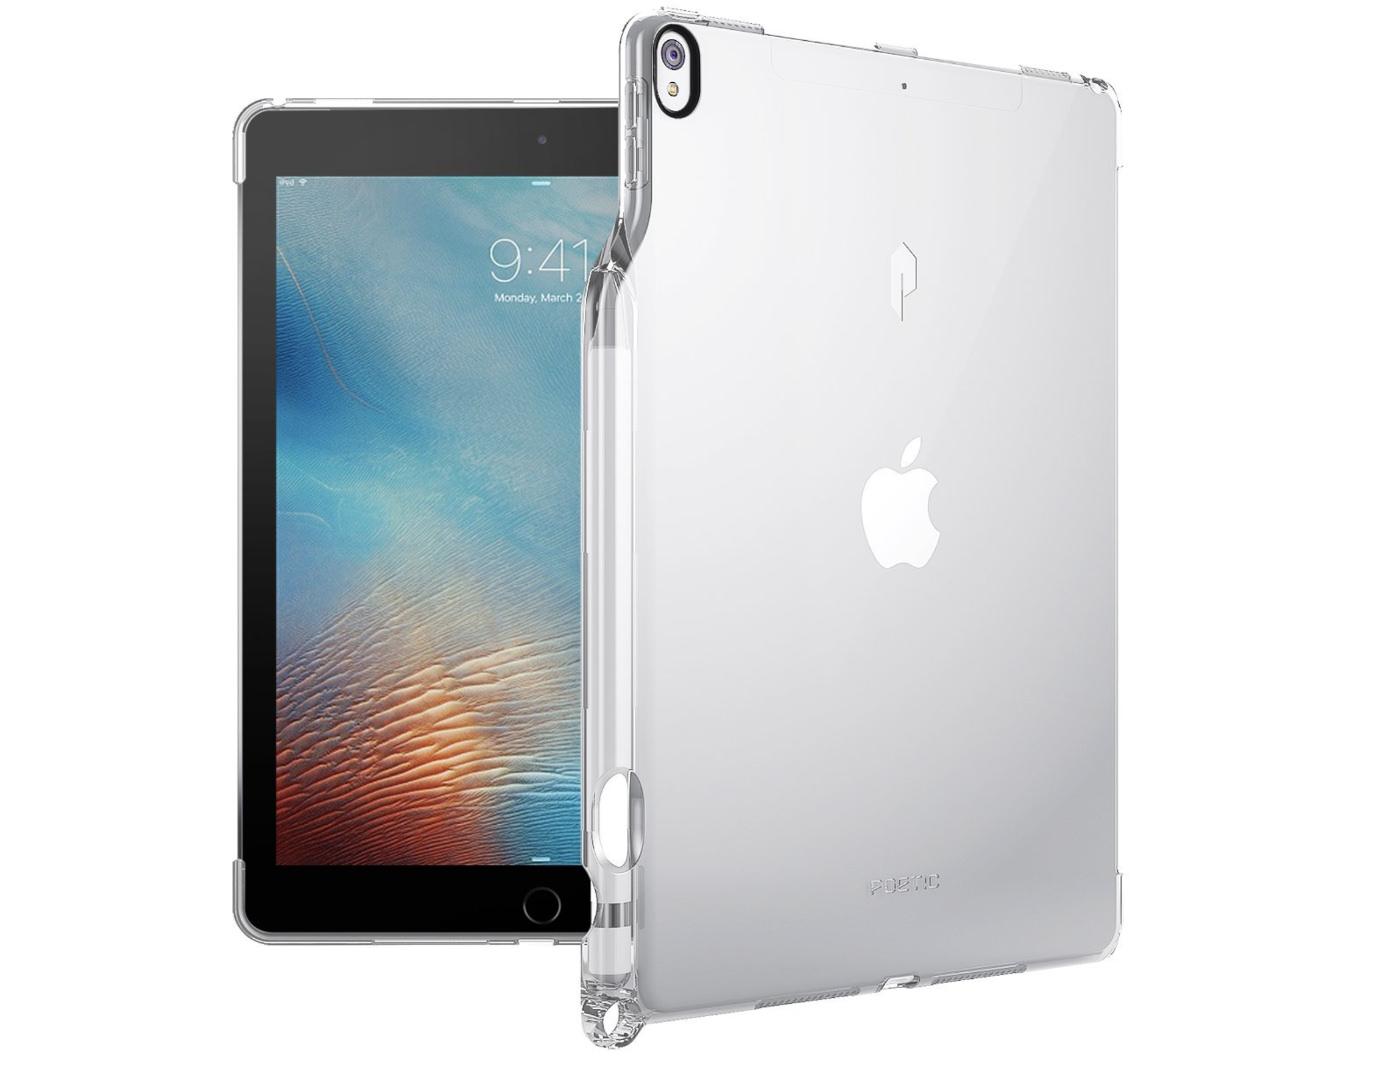 Apple Pencil」収納スロット&「Smart Keyboard」対応iPad Pro 10.5 ケース Poetic-1